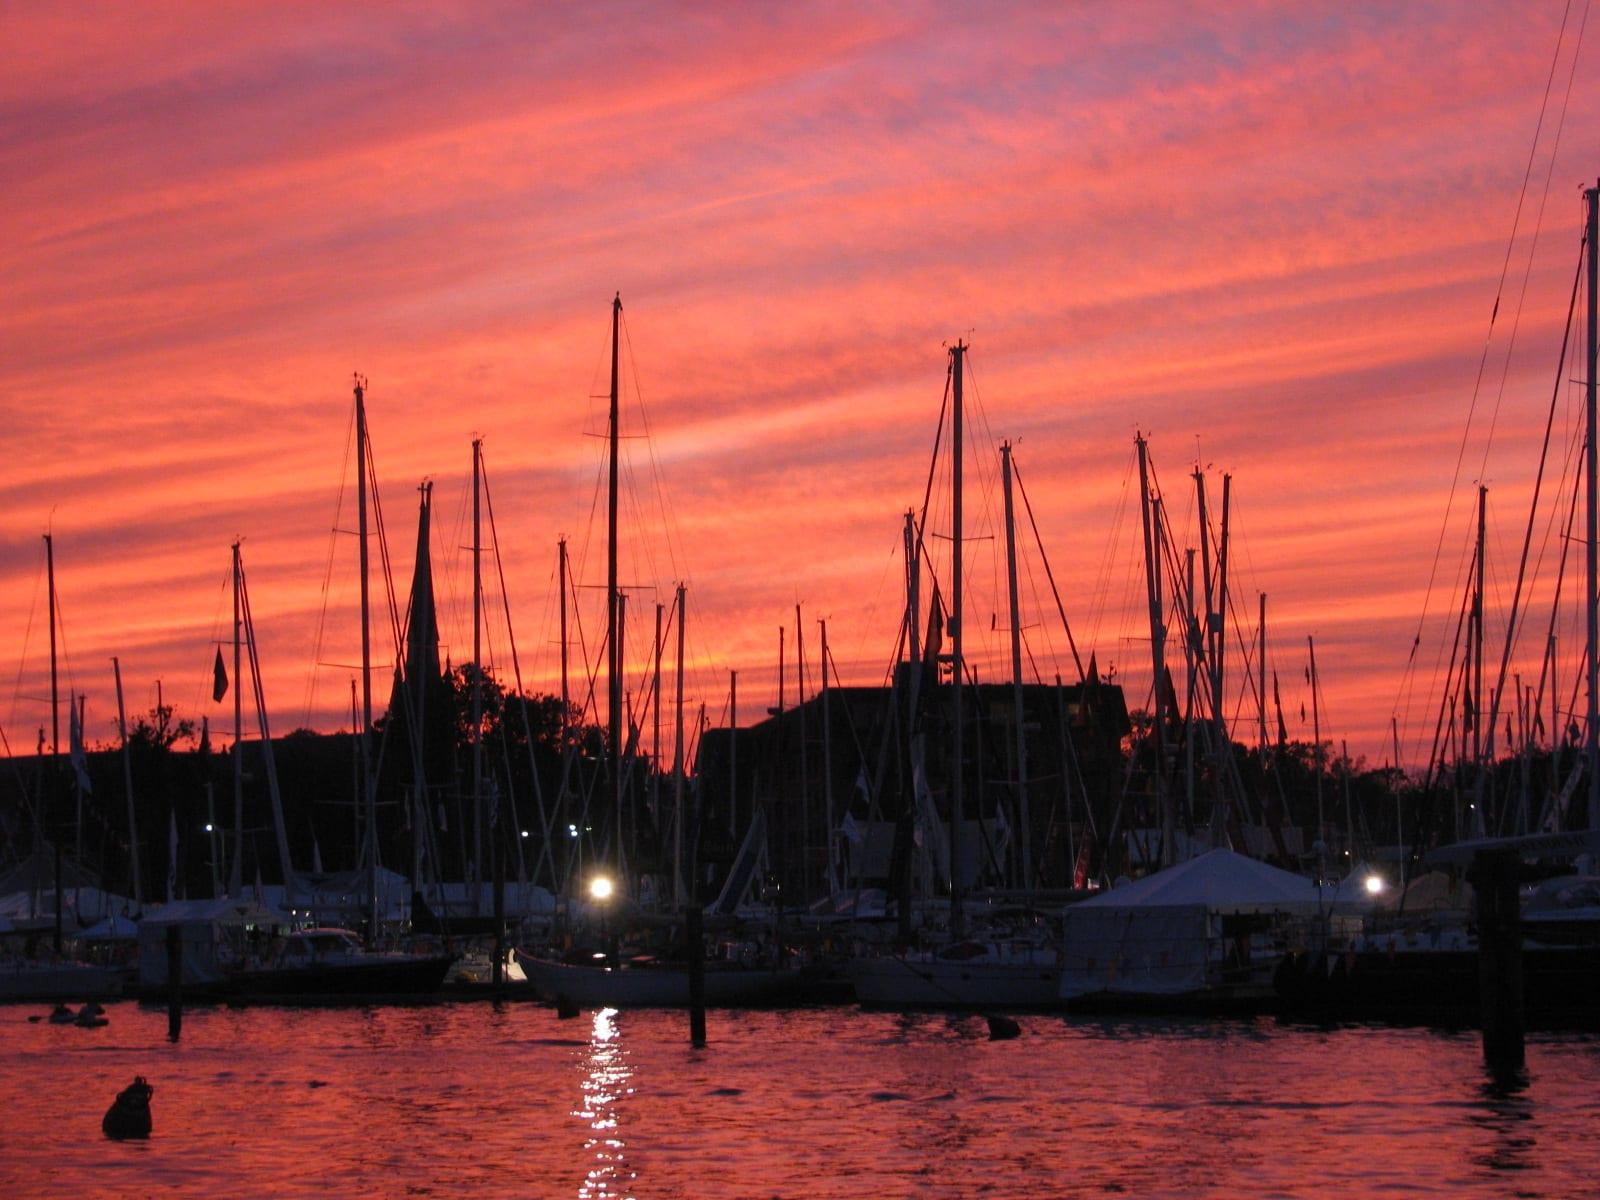 Annapolis Sailors Network - Home